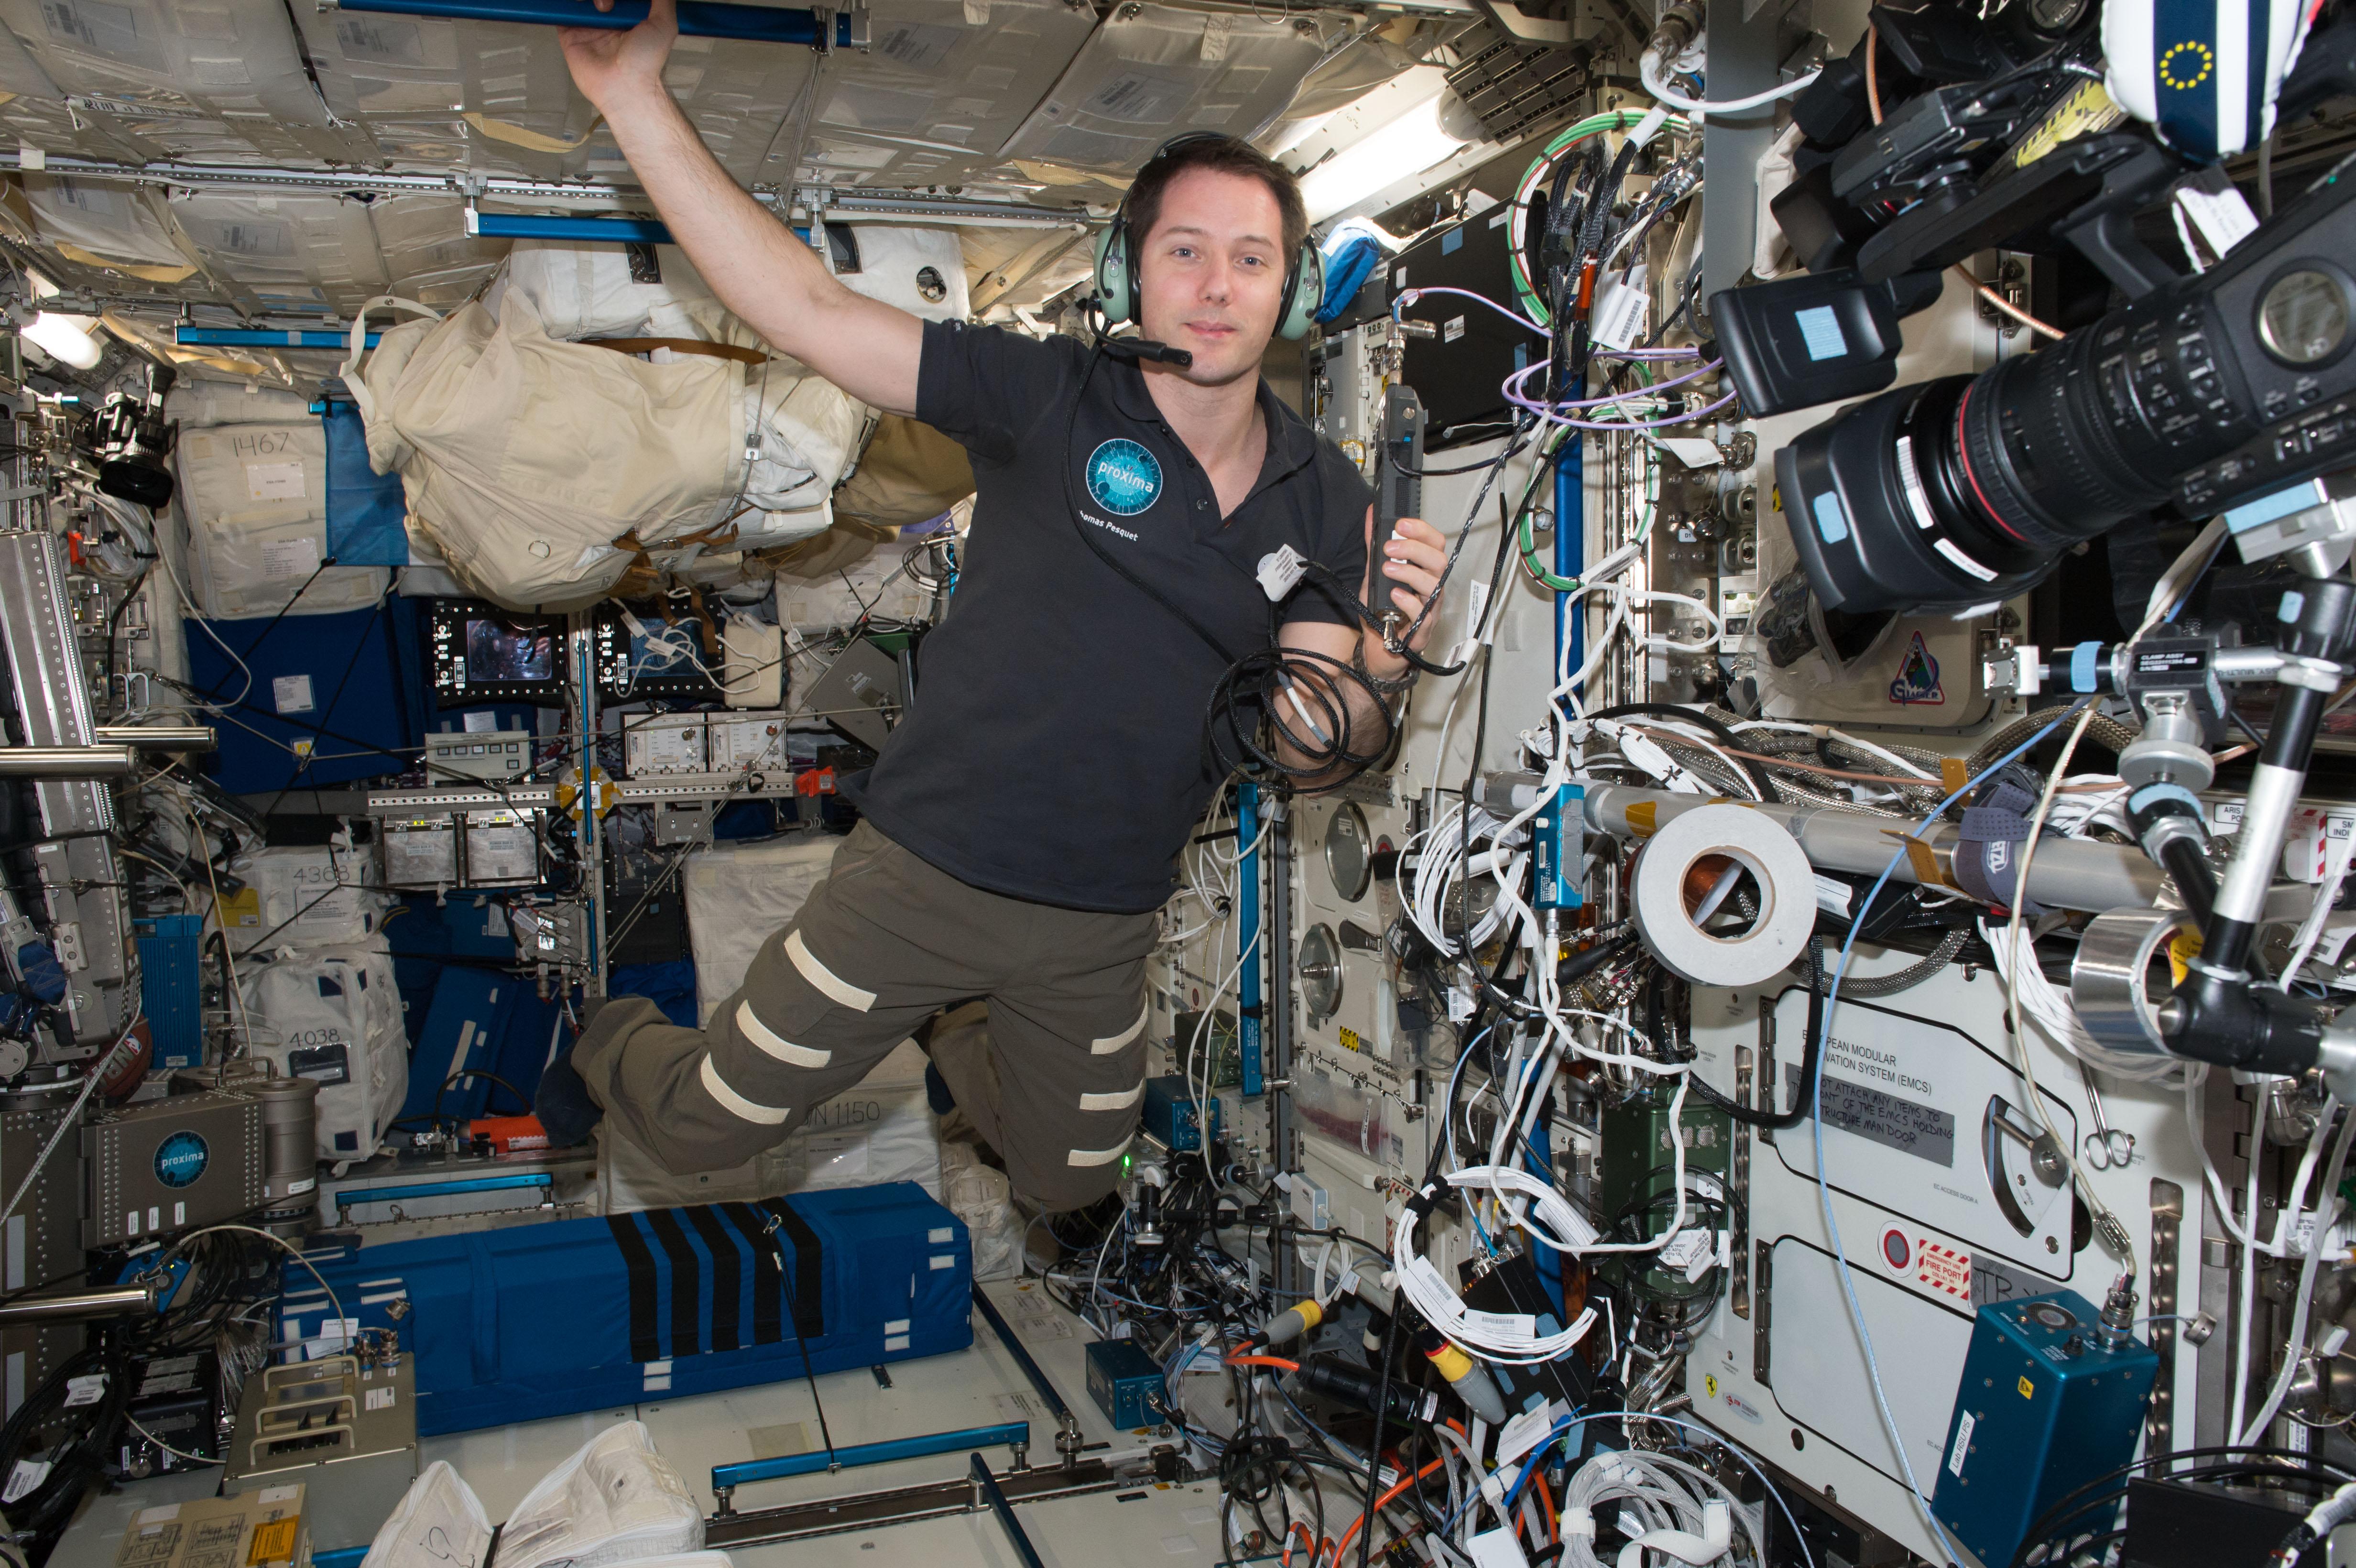 european space agency astronaut jobs - photo #37